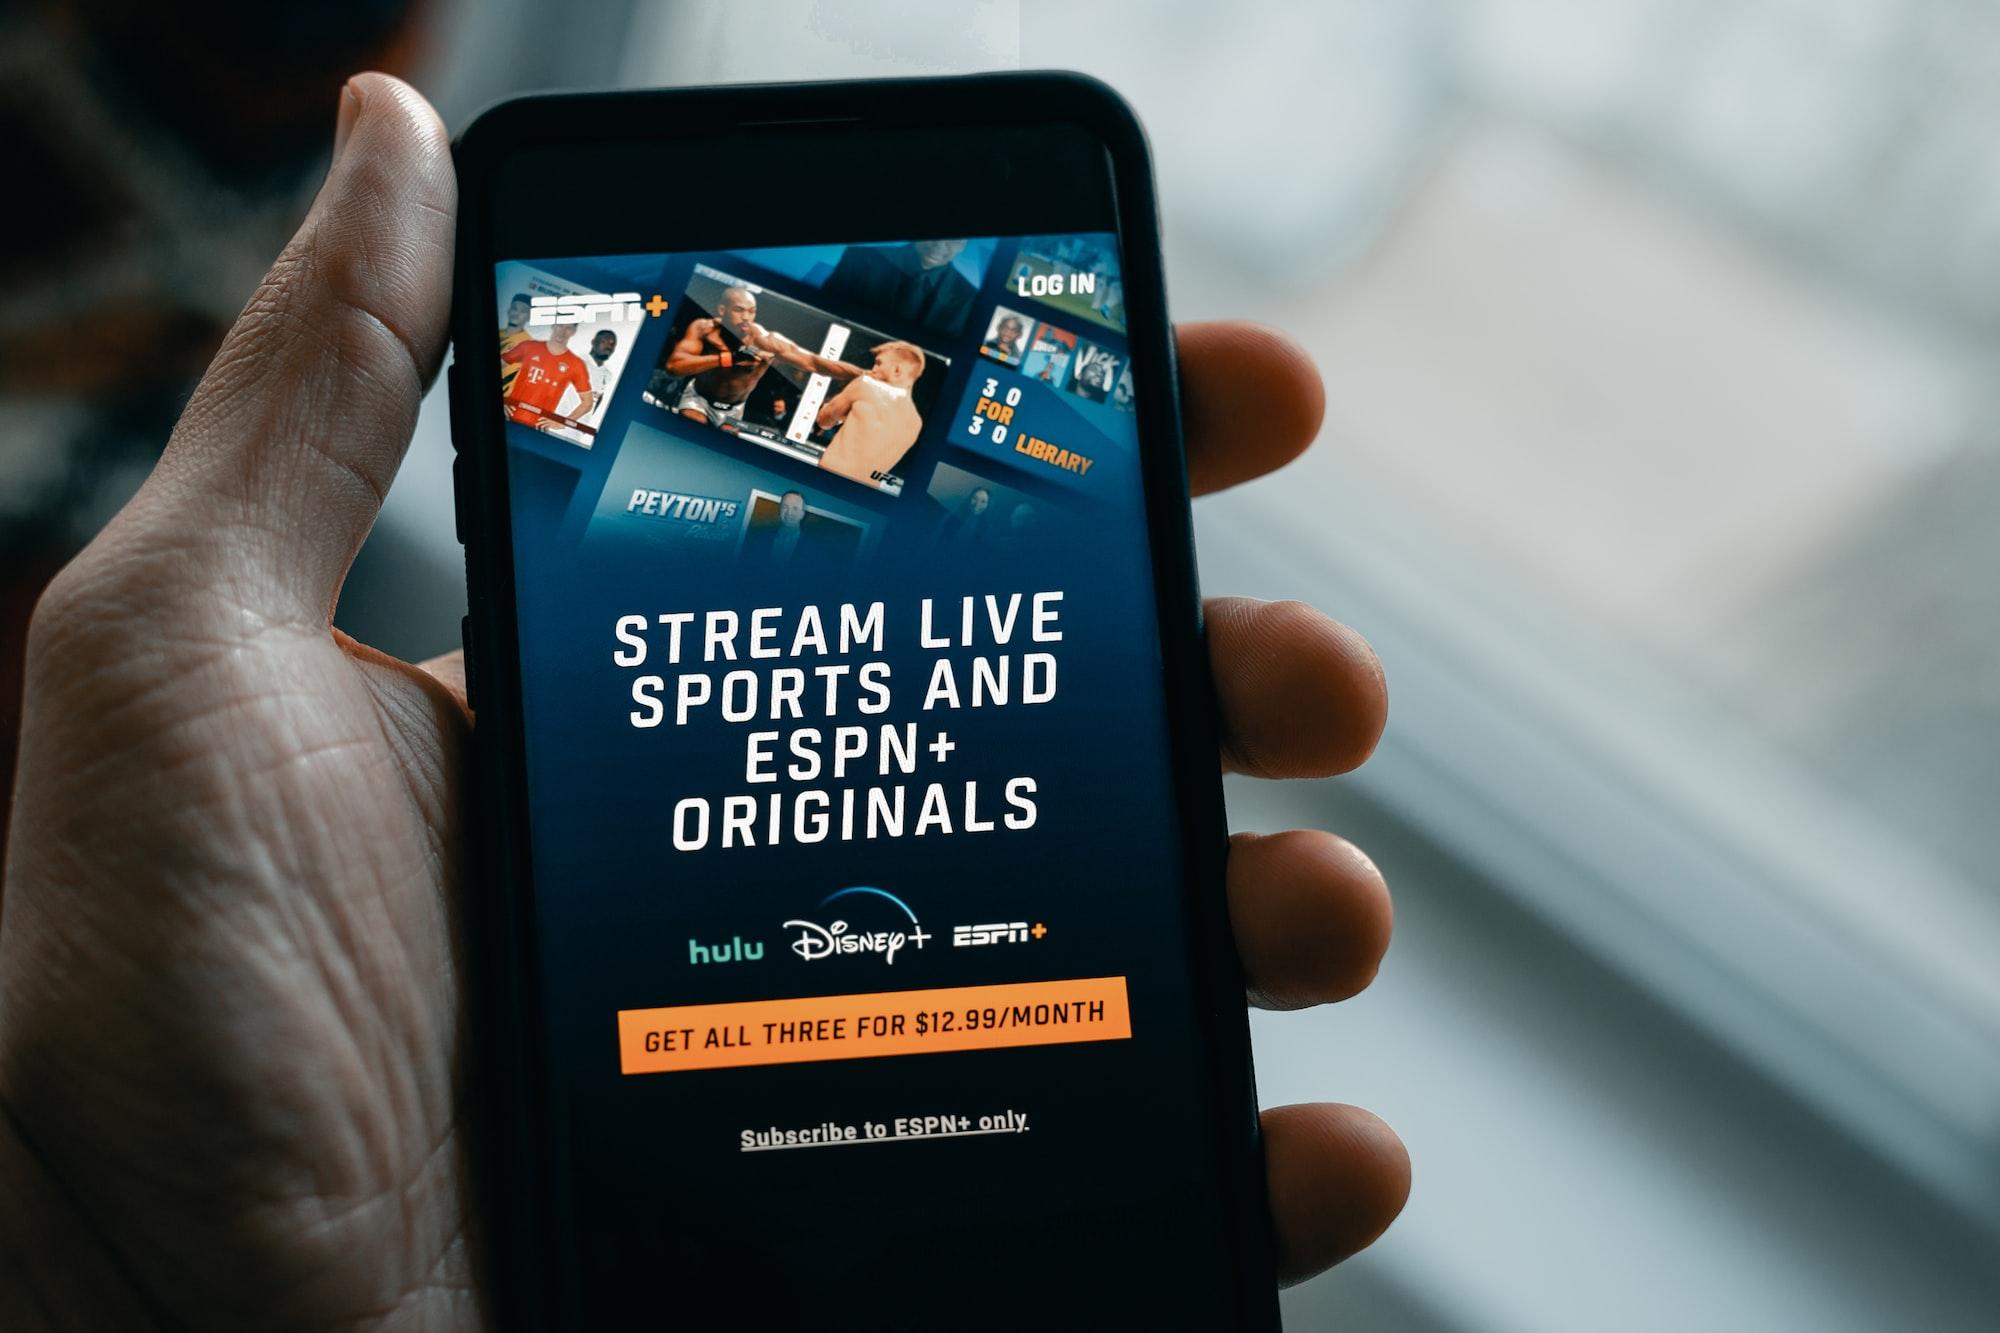 Stream live sports with ESPN Plus  Via techdaily.ca   #streaming #hulu #netflix #amazonprime #espn